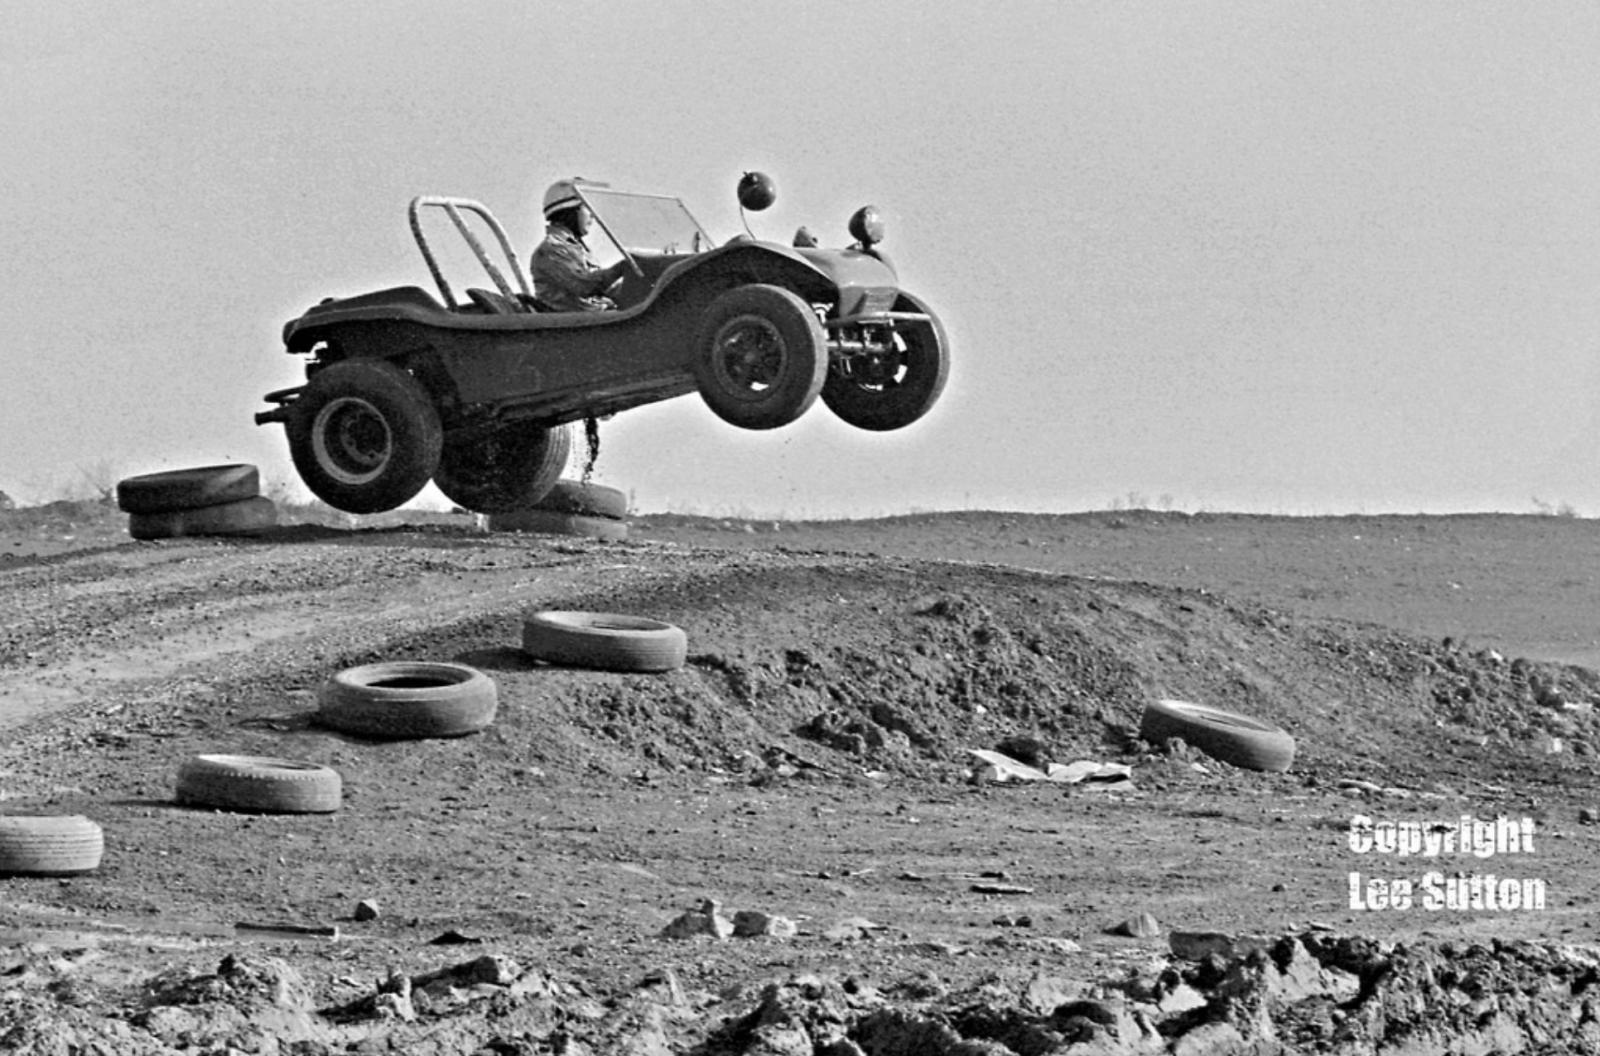 Vintage Dune Buggy